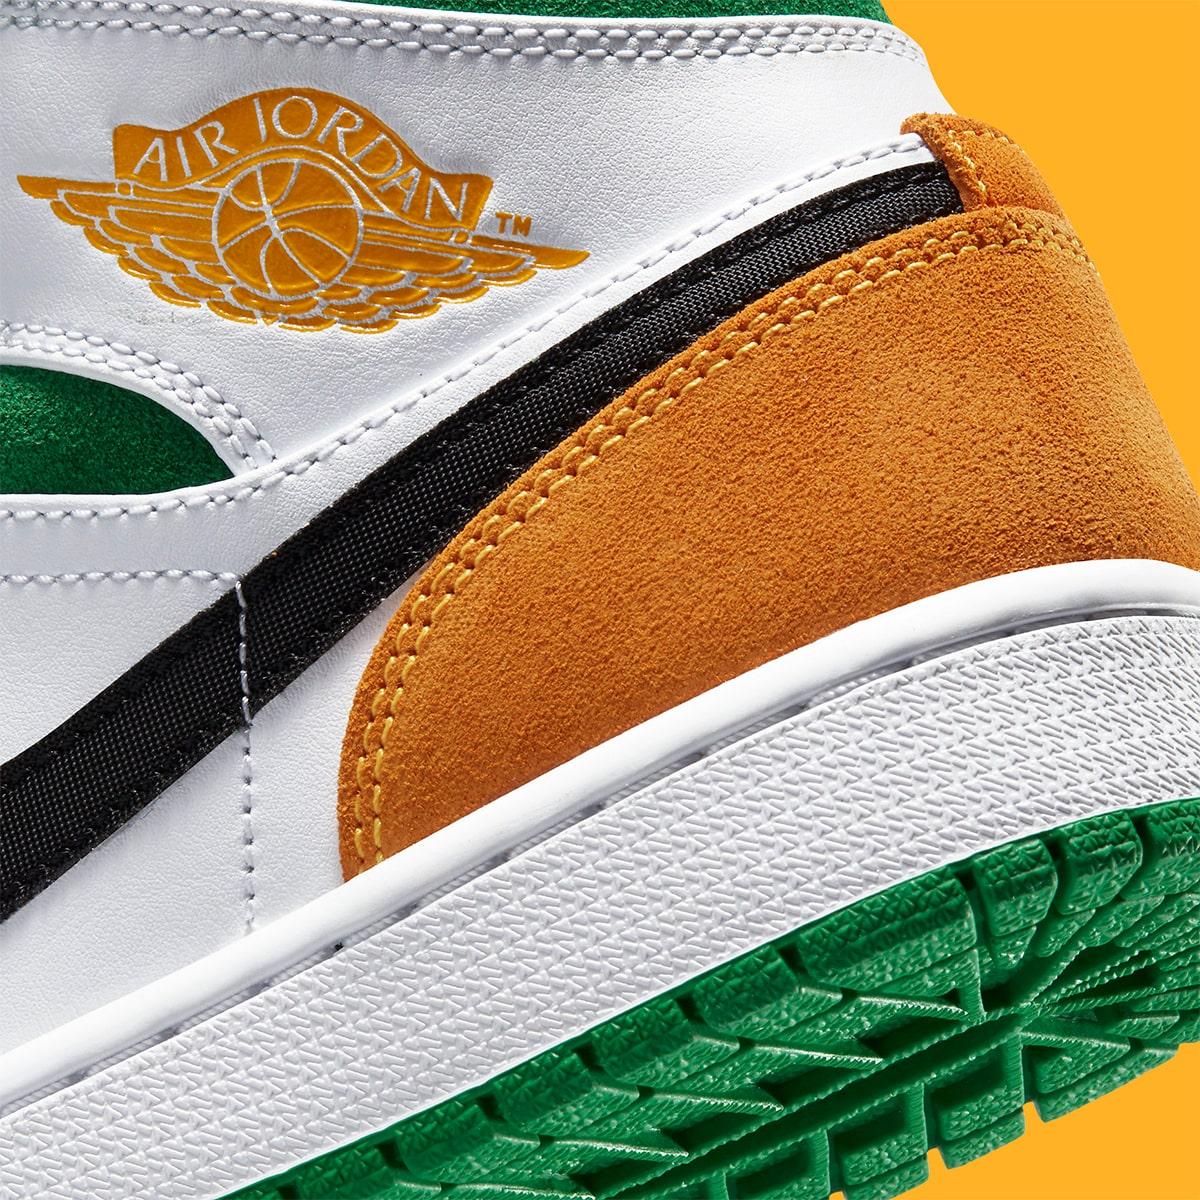 air-jordan-1-mid-se-white-black-green-laser-orange-852542-101-release-date-7